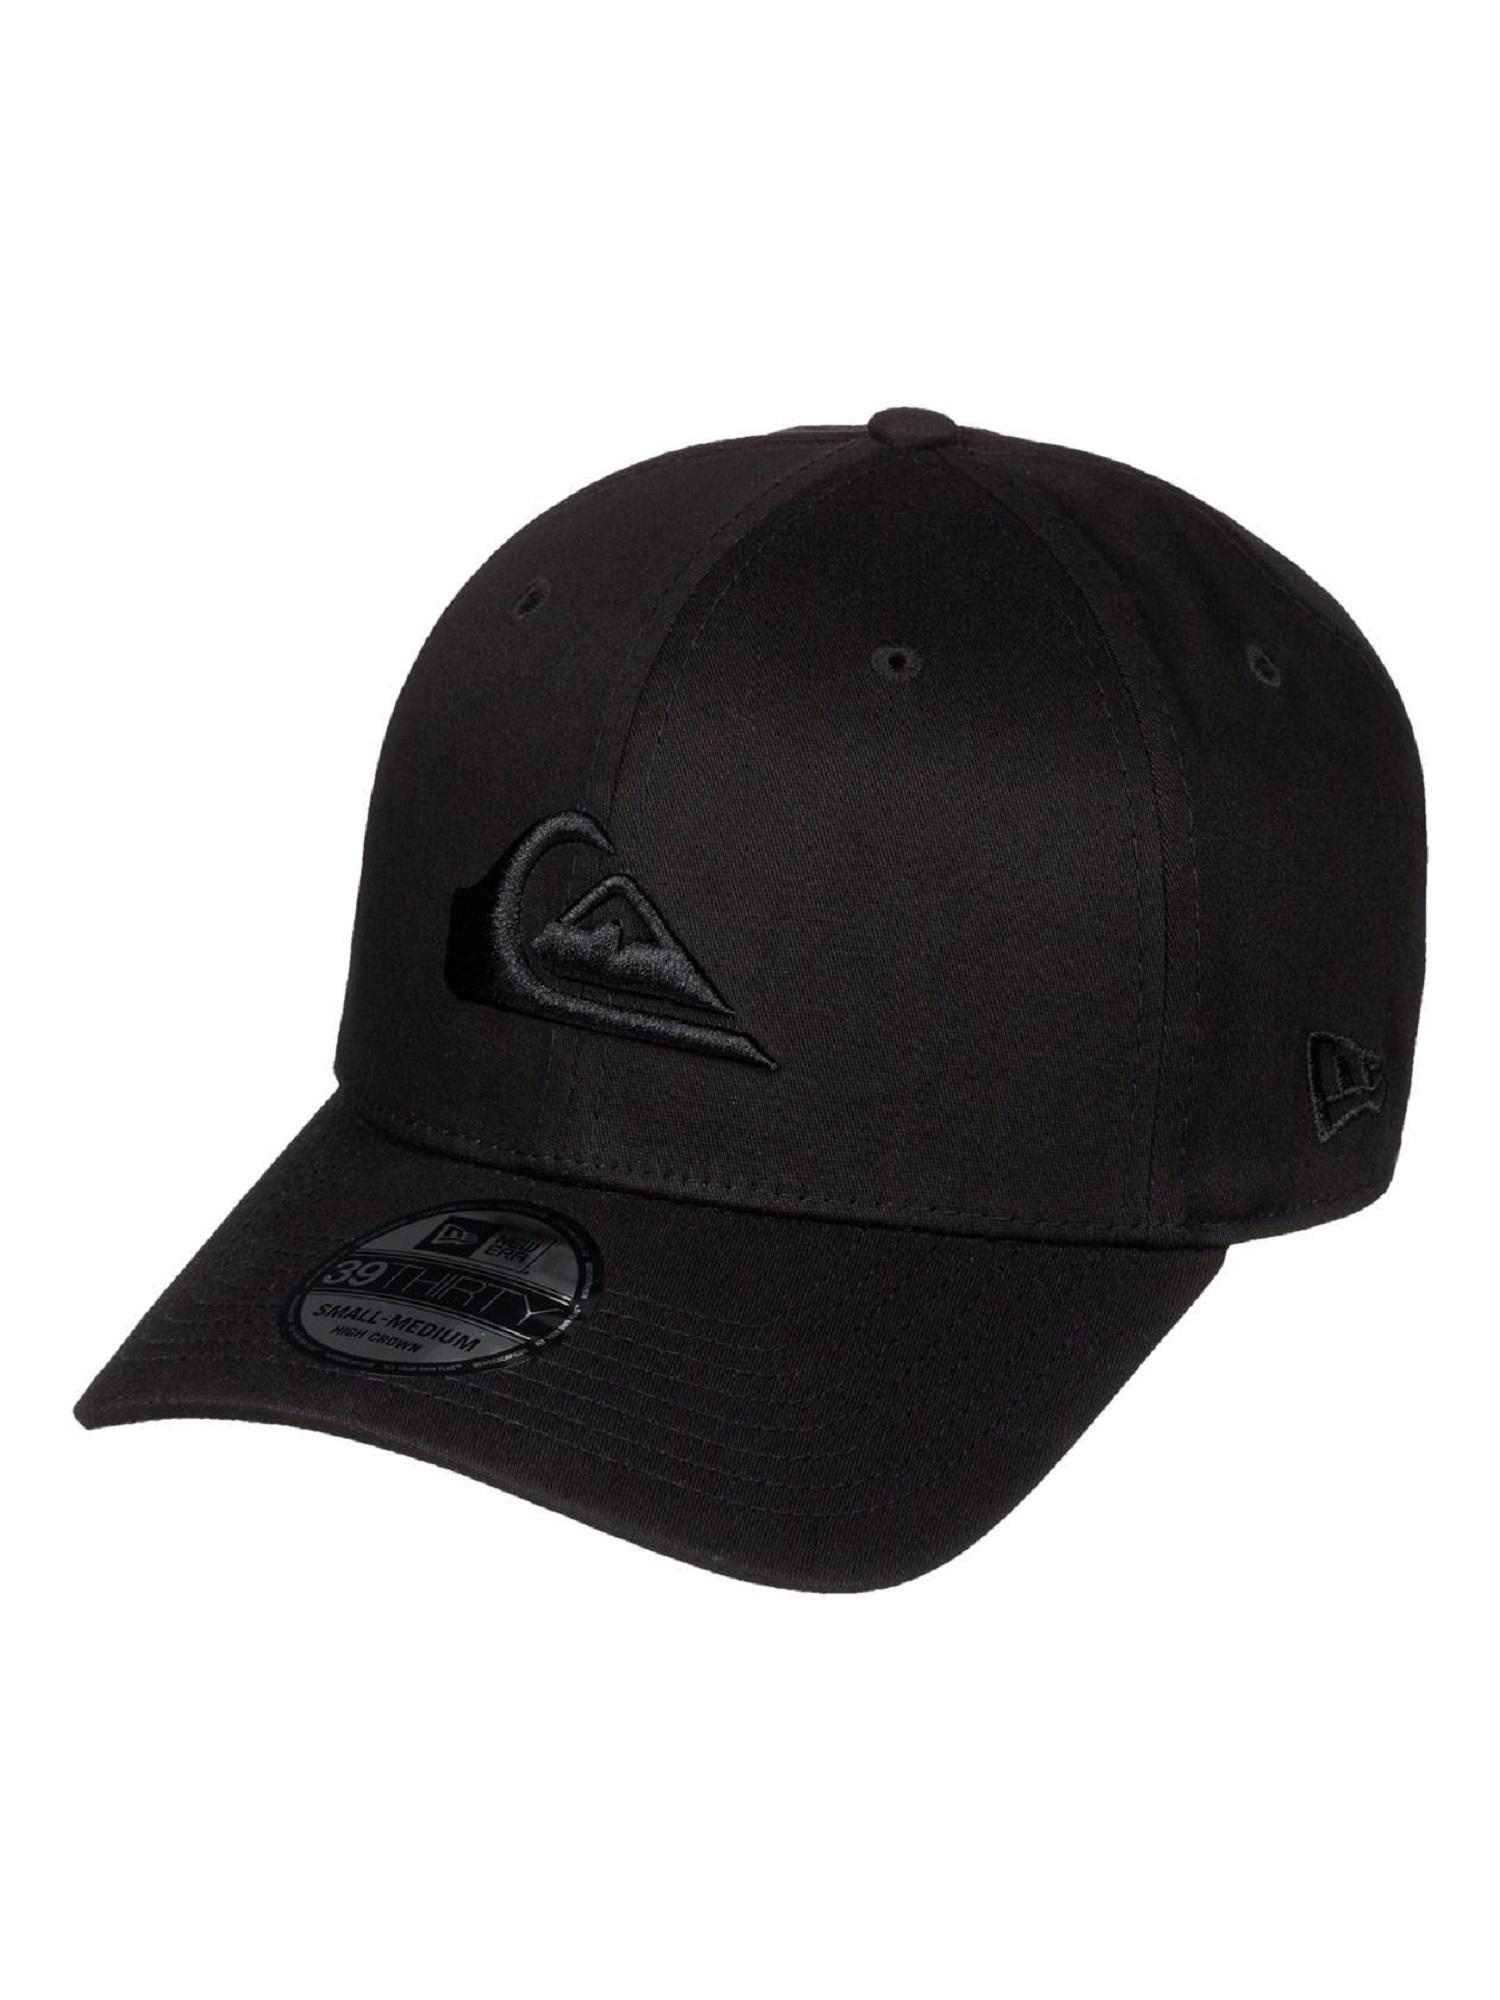 ee50d4f30406f Guy Harvey Trucker Tightline Ball Cap OSFA.  24.00. Quiksilver Mountain    Wave Ball Cap